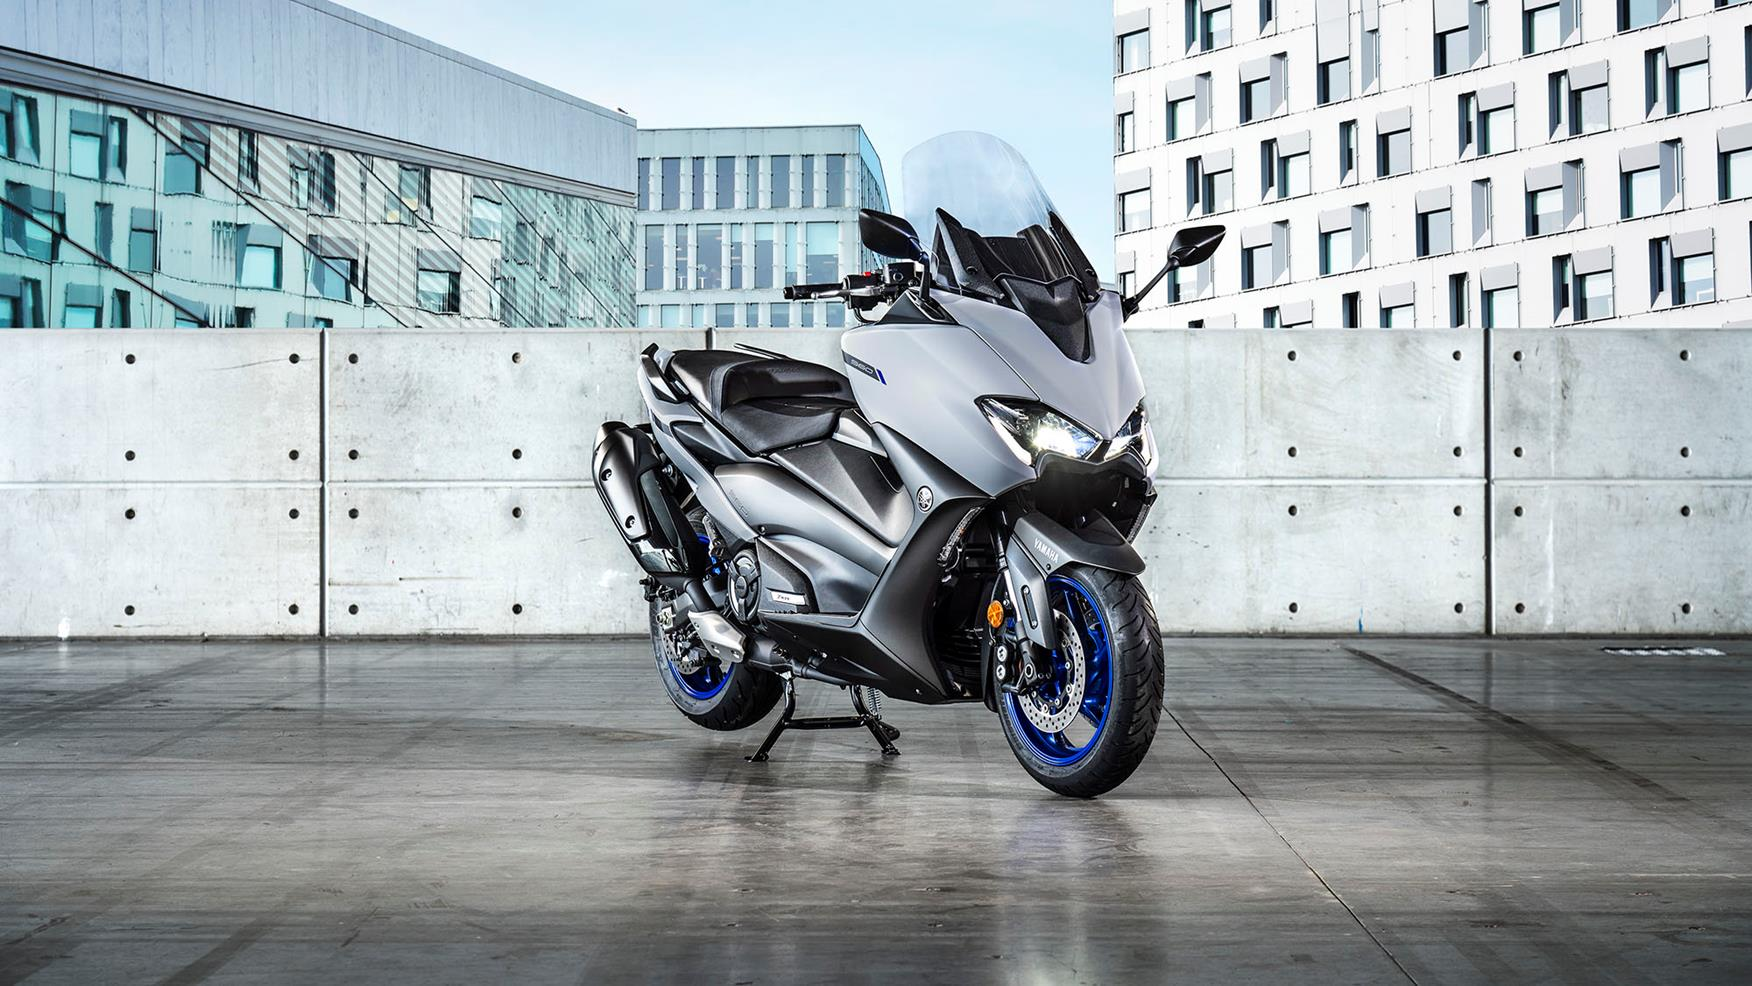 The 2020 Yamaha TMAX 560